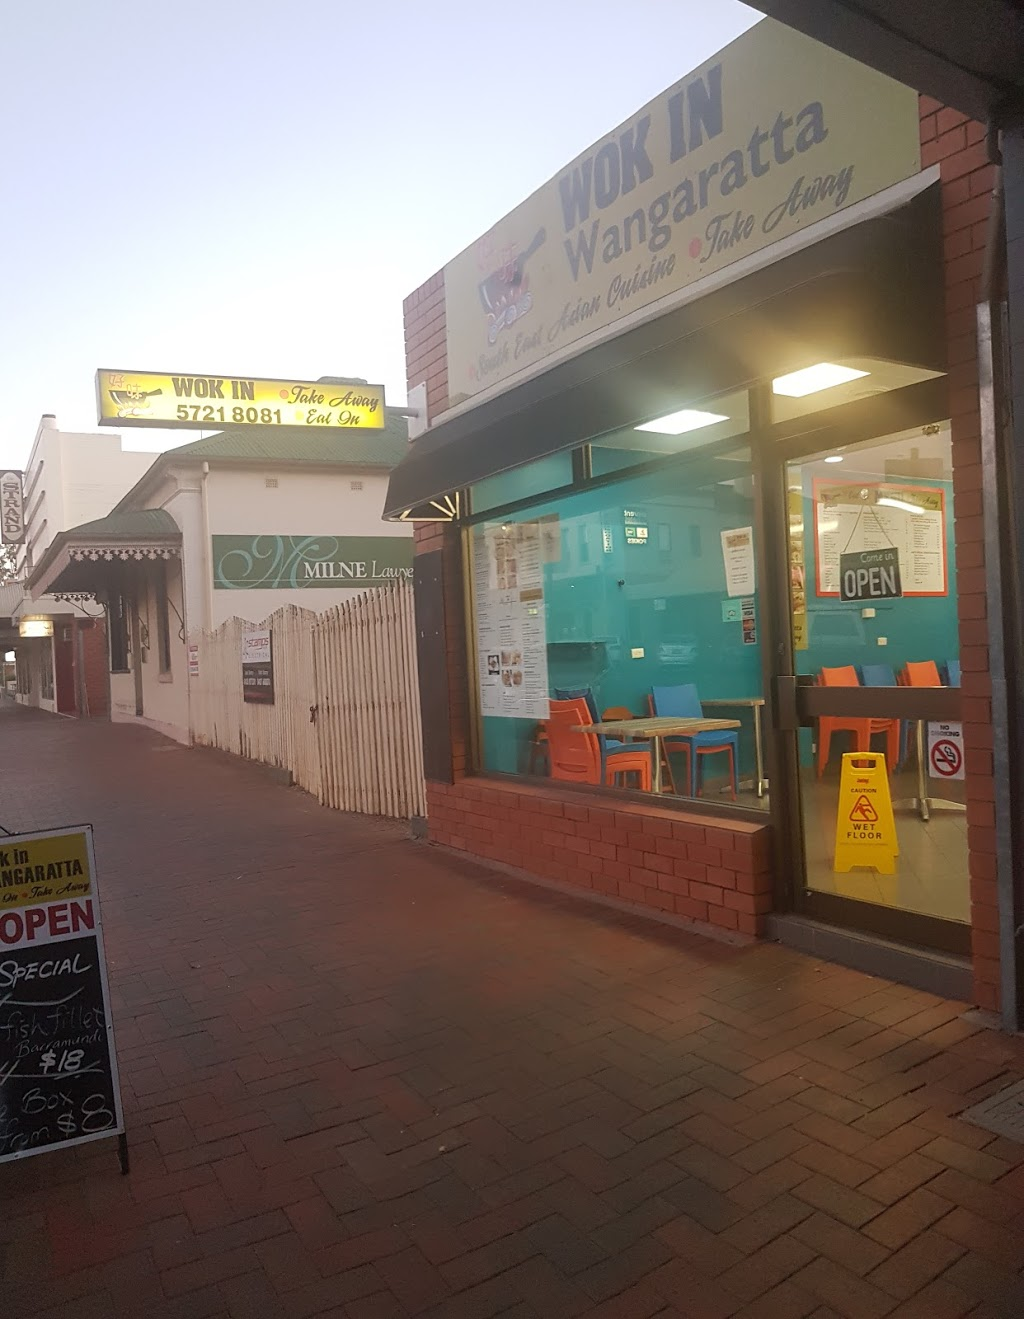 Wok In | restaurant | 29A Reid St, Wangaratta VIC 3677, Australia | 0357218081 OR +61 3 5721 8081